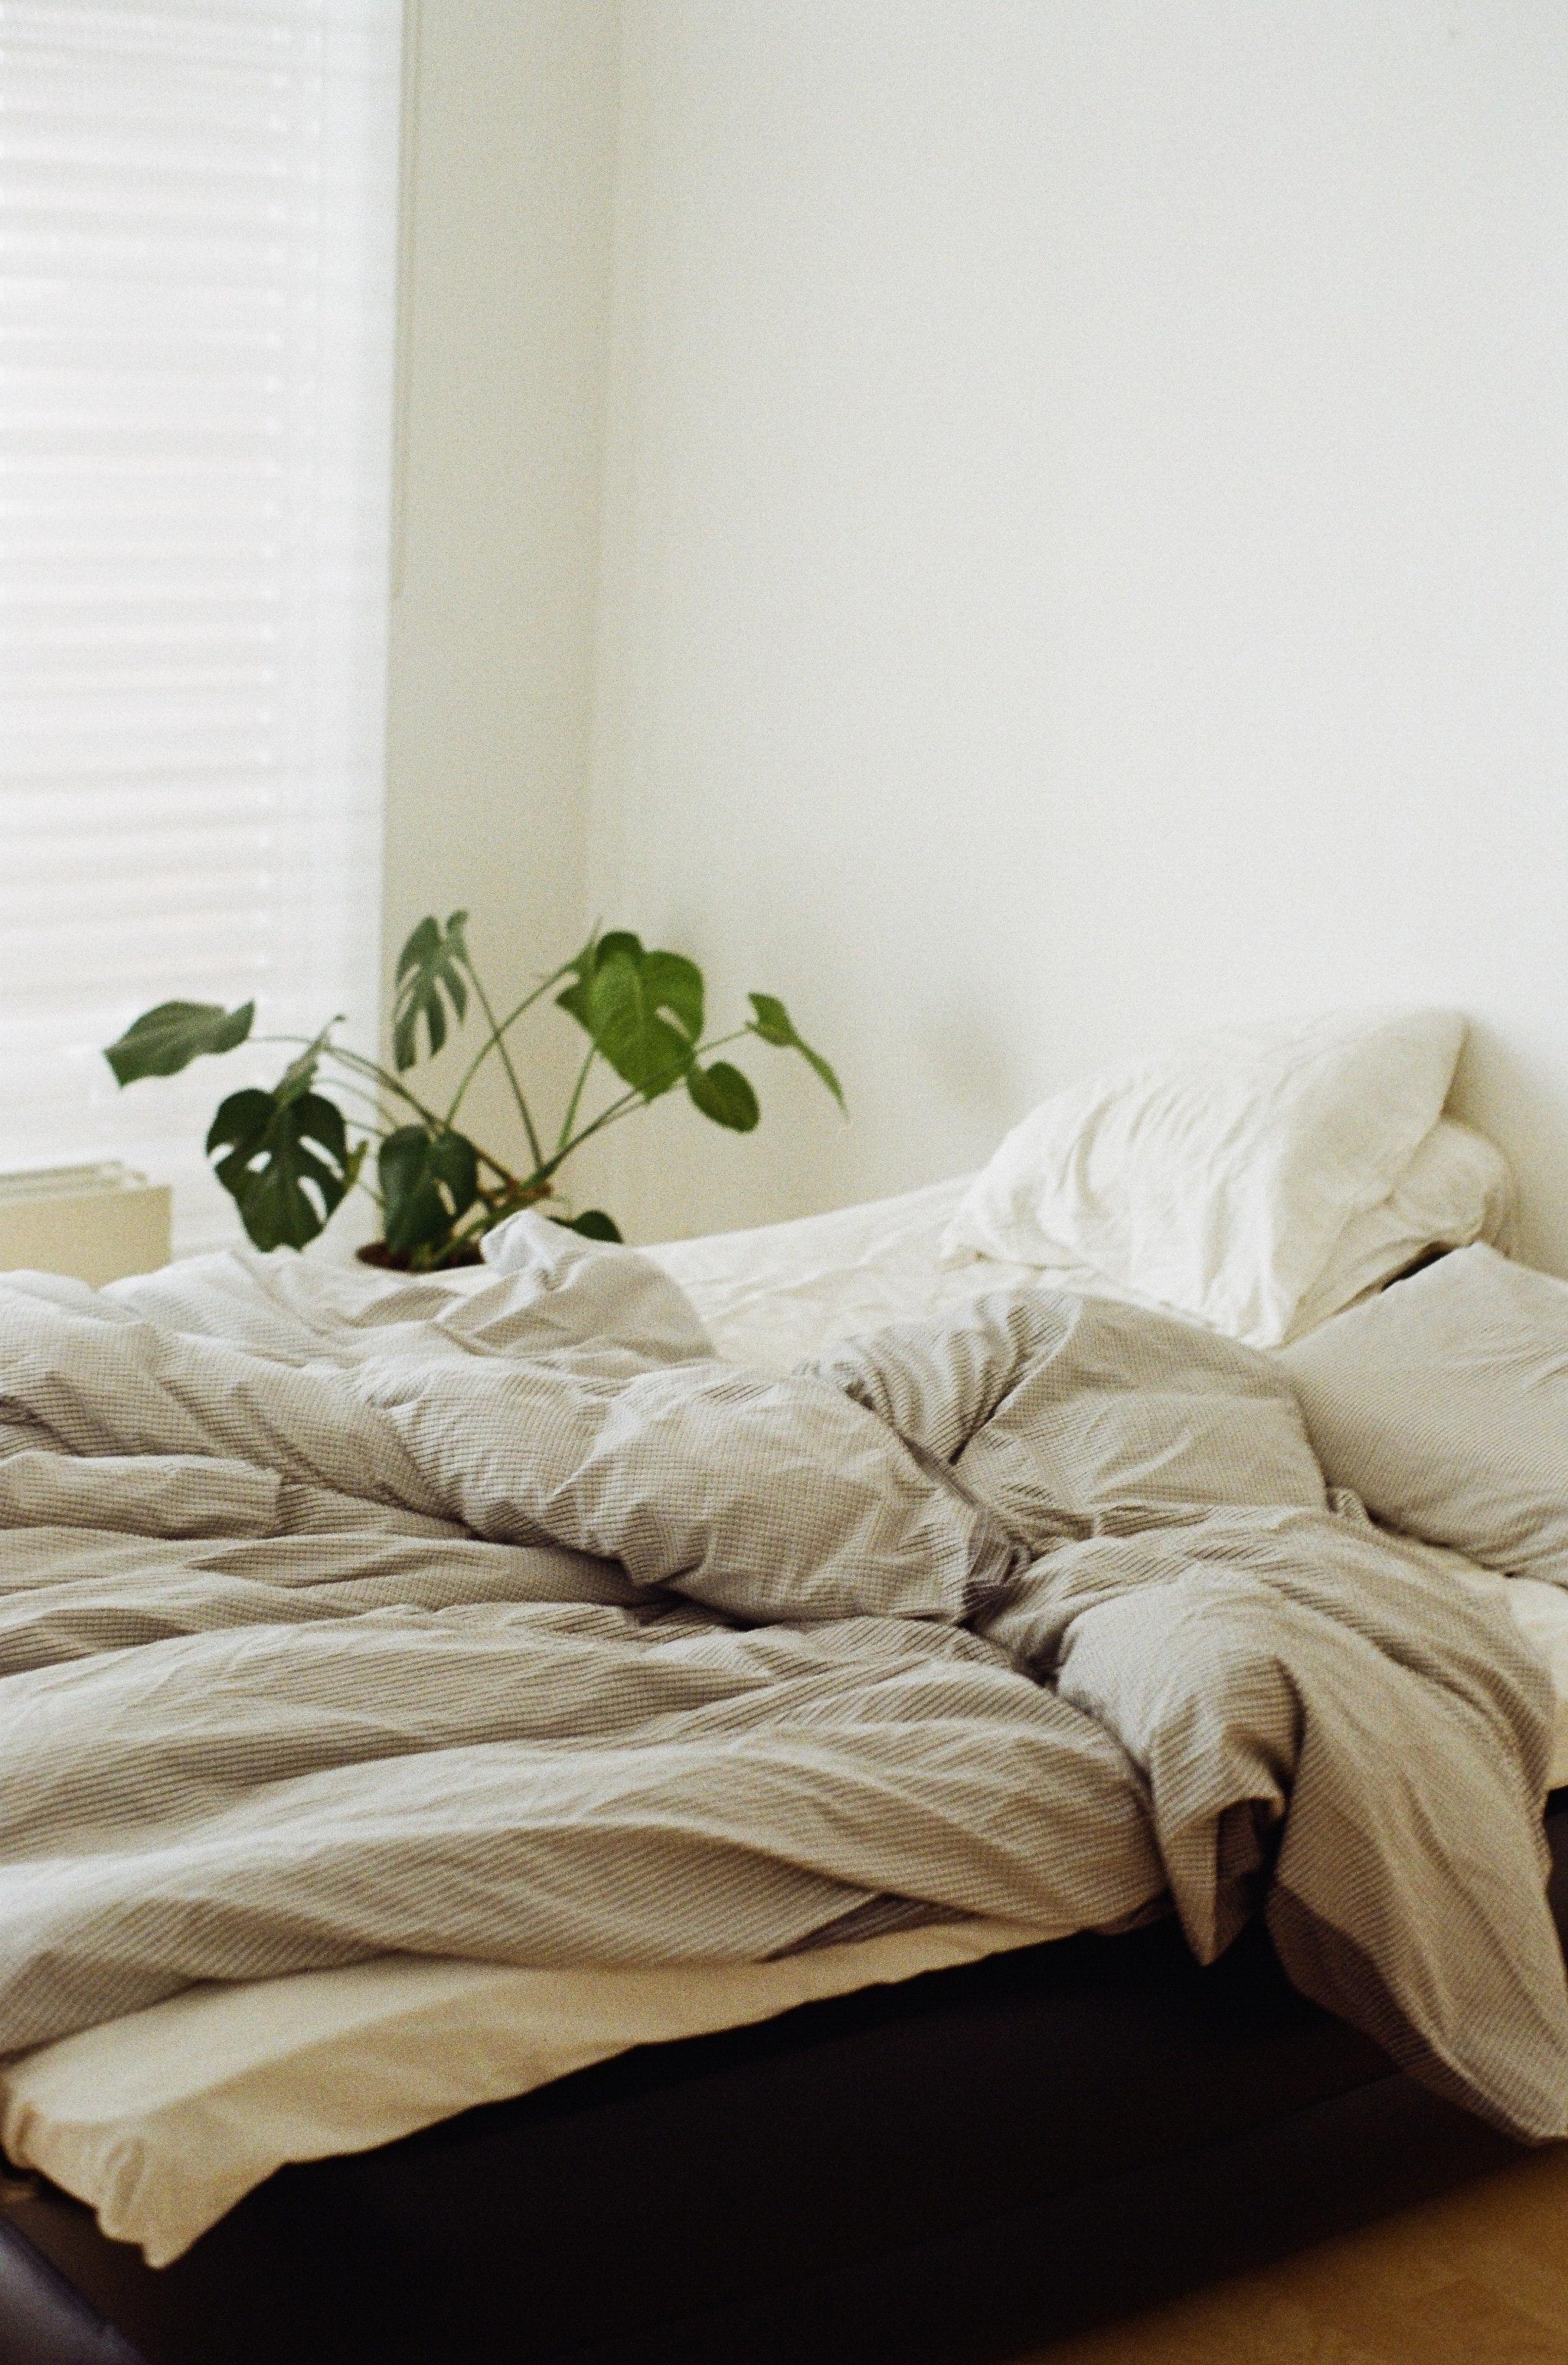 slaapkamer beddengoed